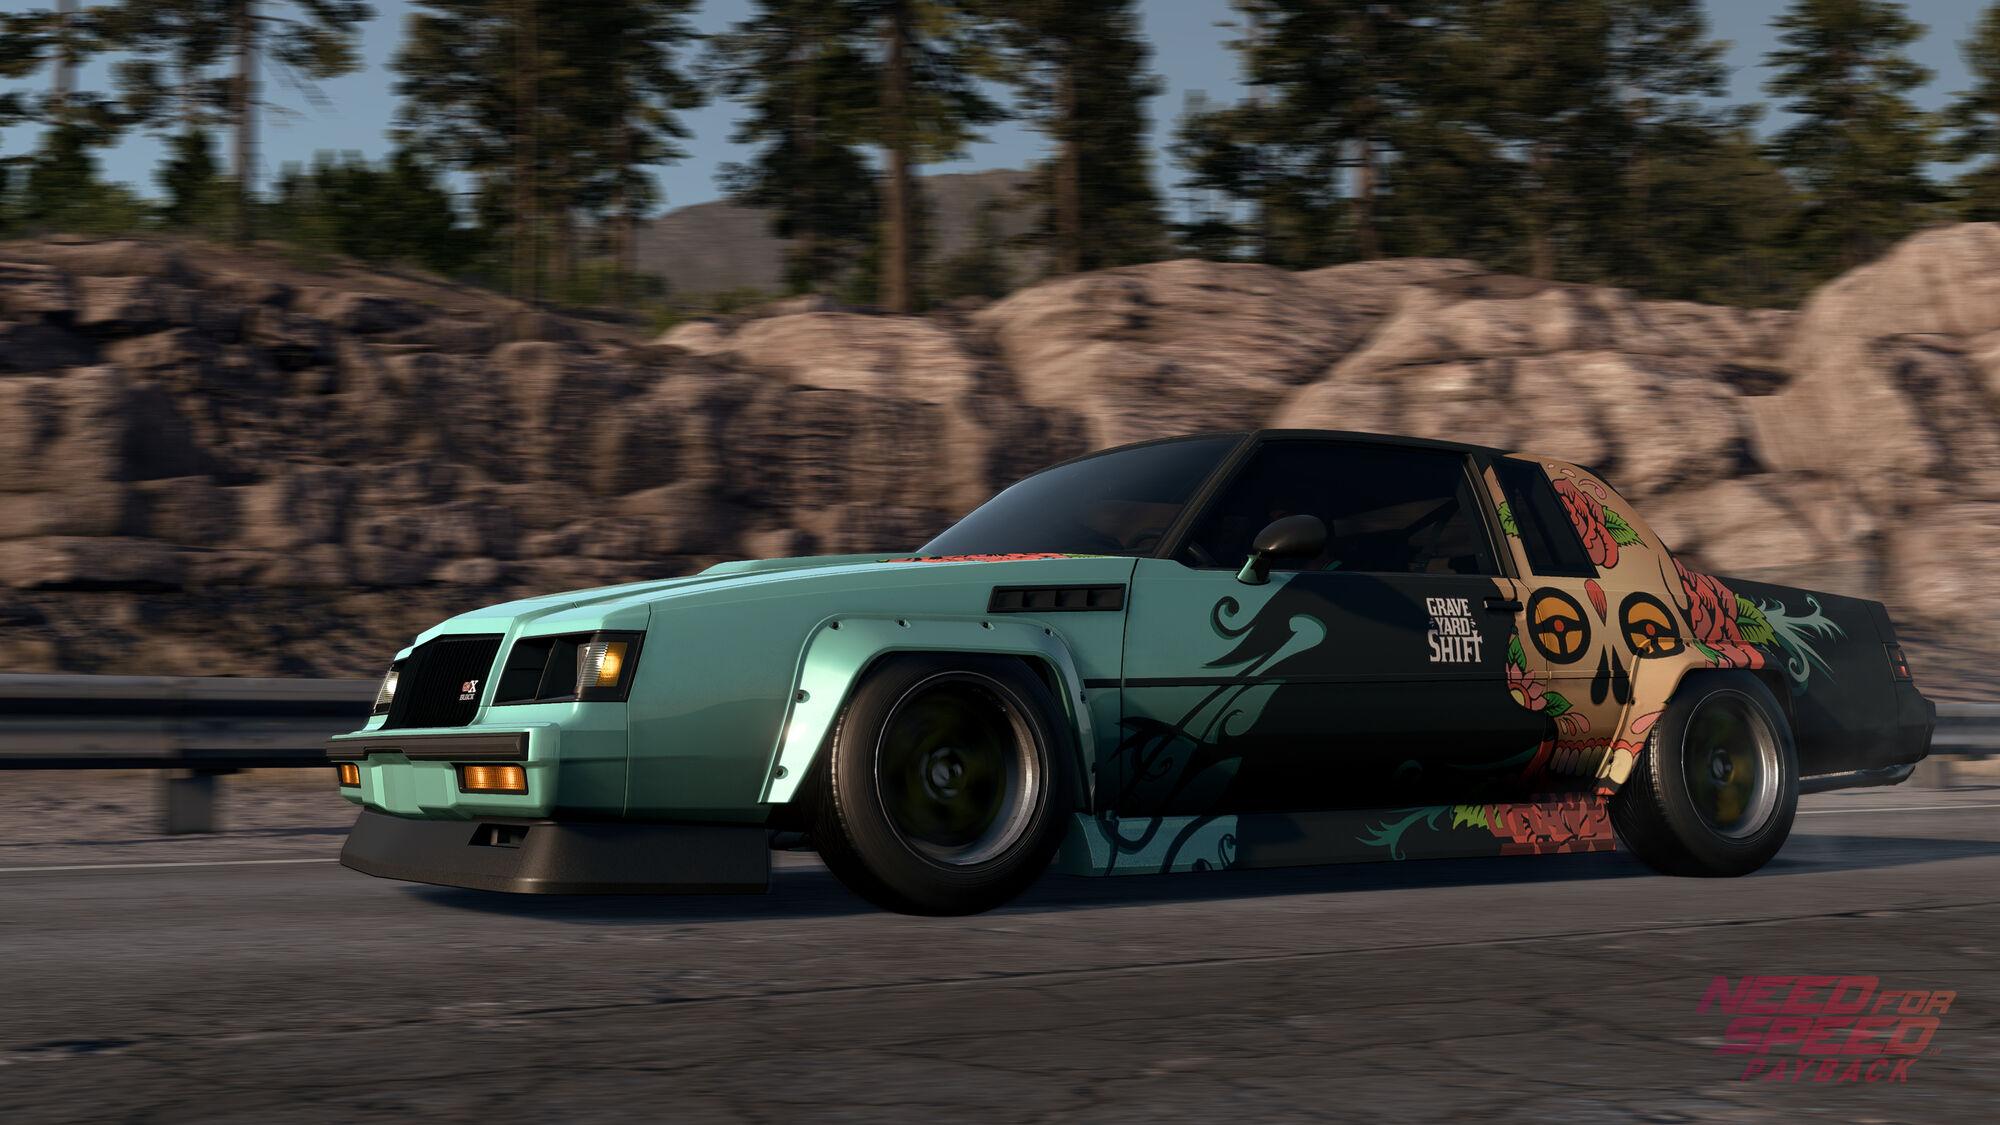 Patch 01 | Need for Speed Wiki | FANDOM powered by Wikia